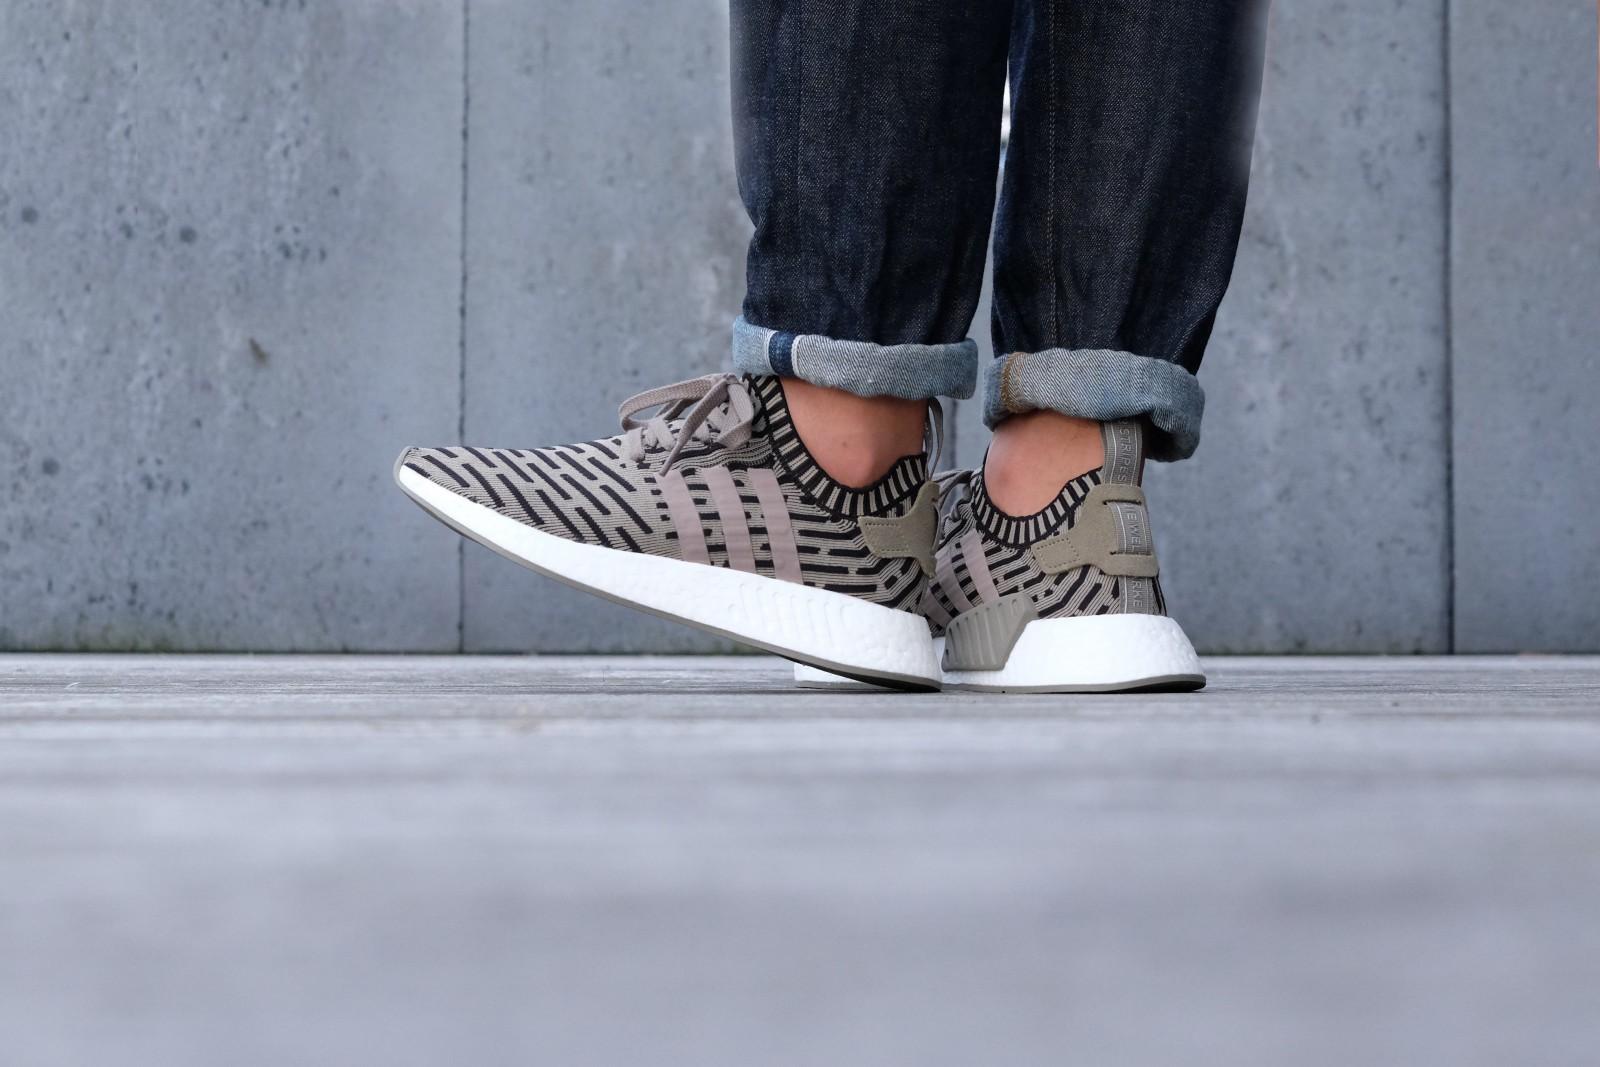 Adidas Debuts The NMD R2 Primeknit